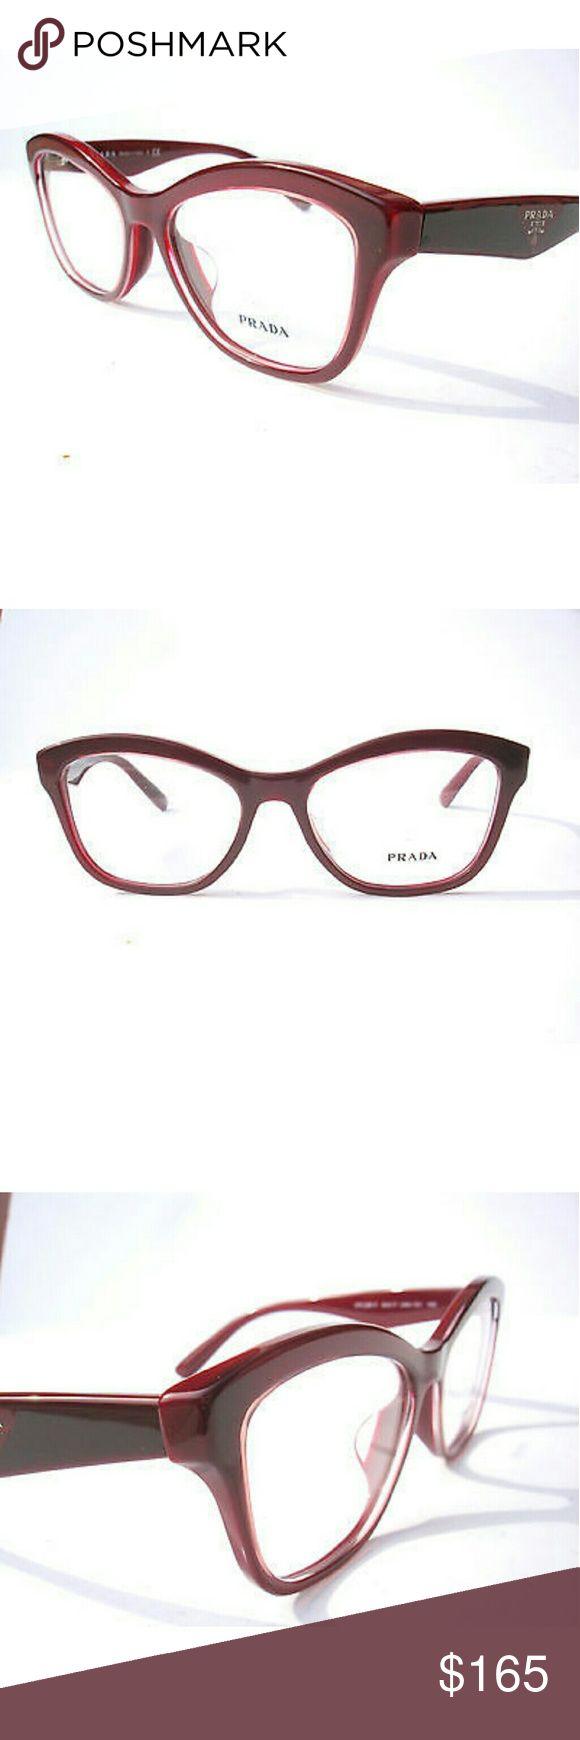 Prada Eyeglasses New Prada Eyeglasses Burgundy frame Size 54-17-140 Includes Chanel case Prada Accessories Glasses